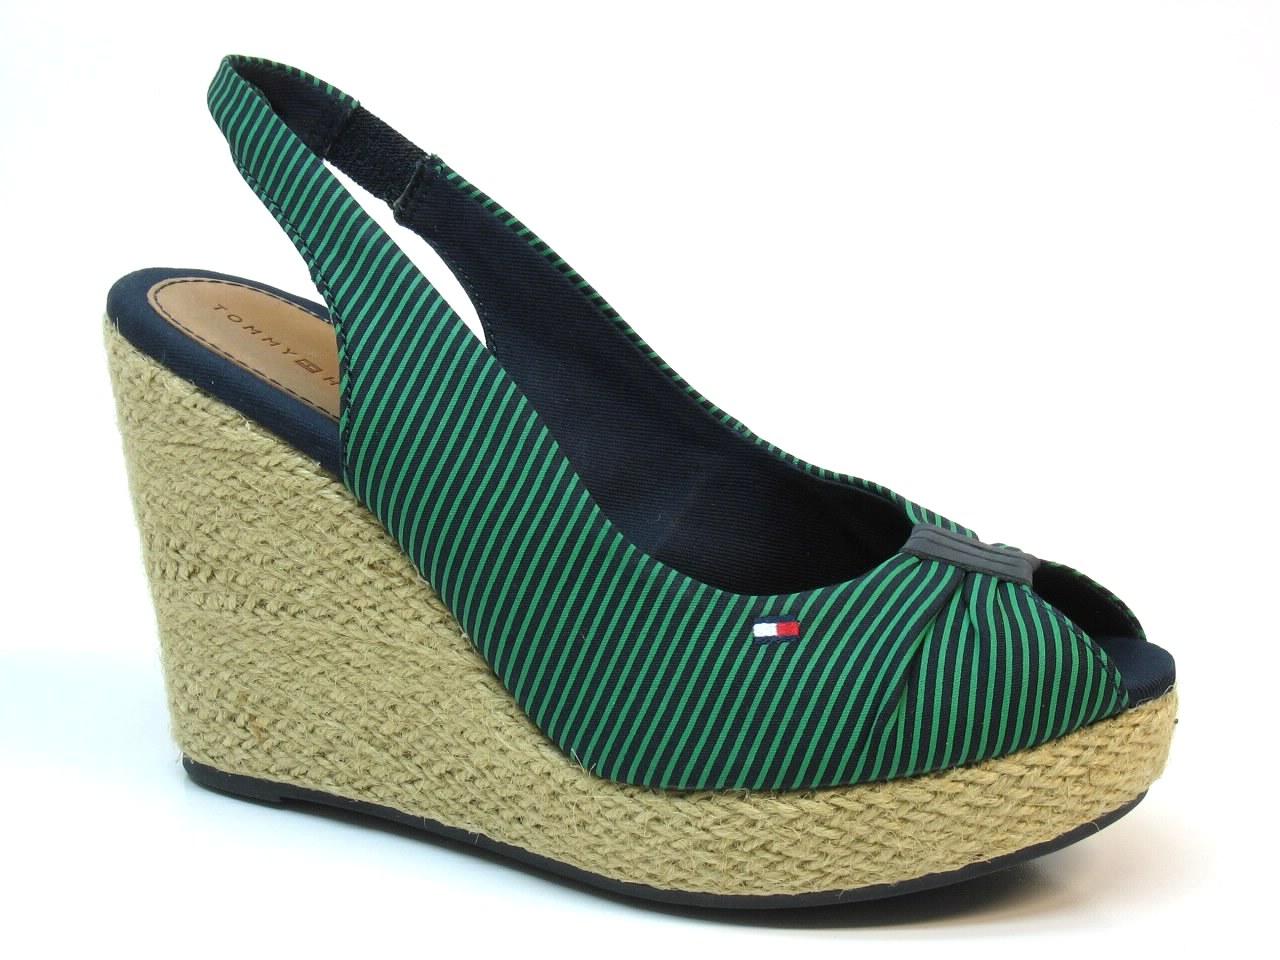 Sandálias de Cunha Tommy Hilfiger - 309 15409